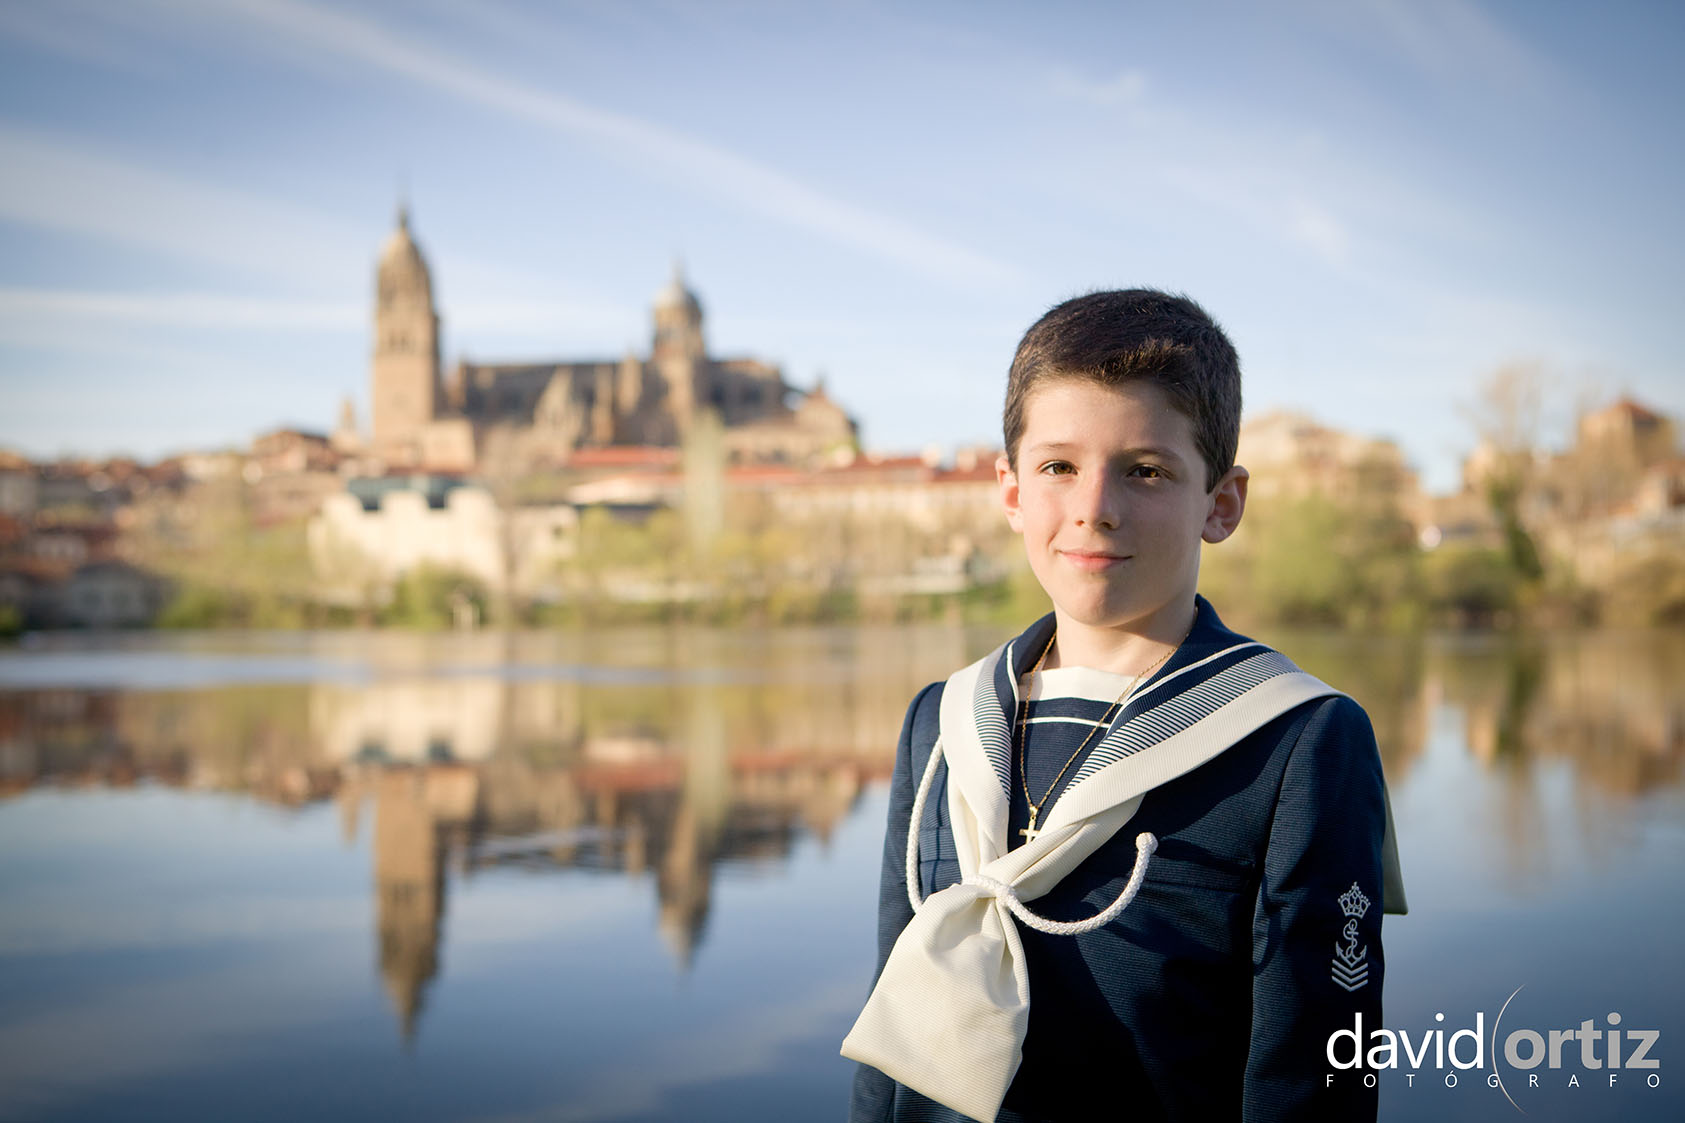 Fotografia y reportaje, realizado por David Ortiz Fotografo